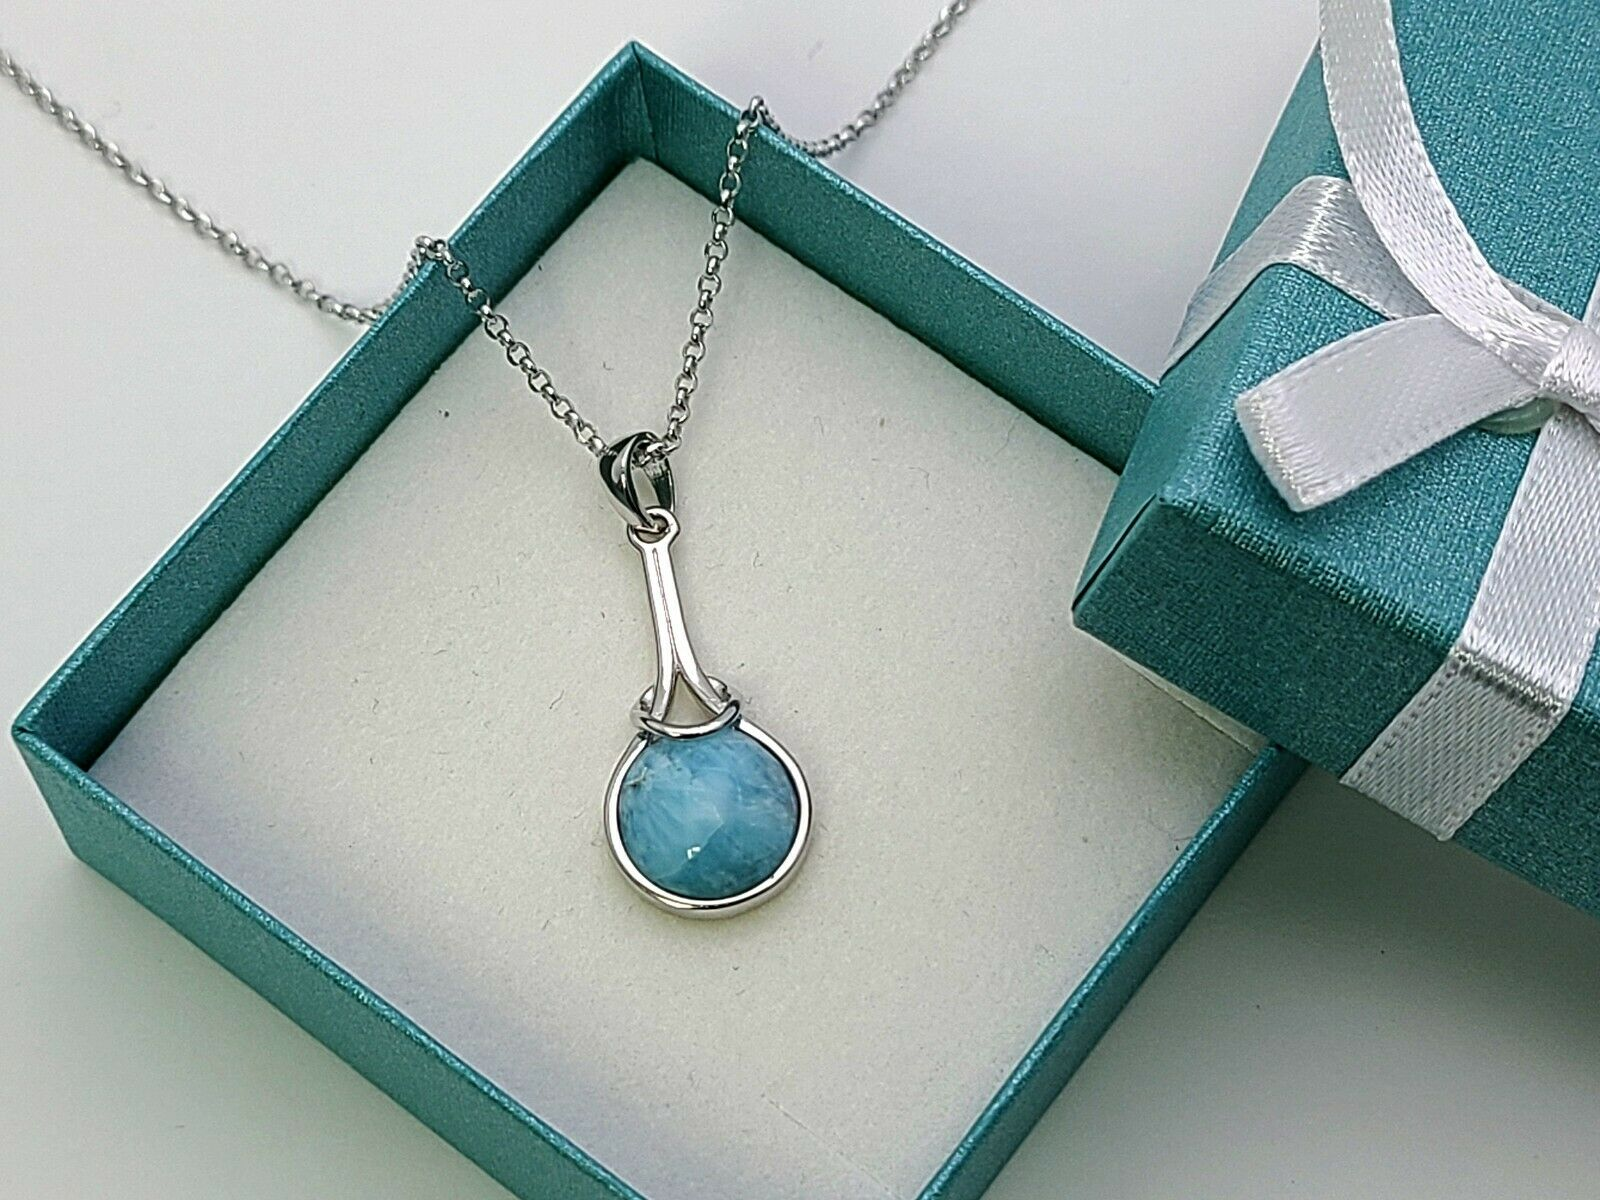 silver iolite necklace larimar iolite necklace Dominican larimar necklace larimar gemstone jewellery half bezel setting ET12N015